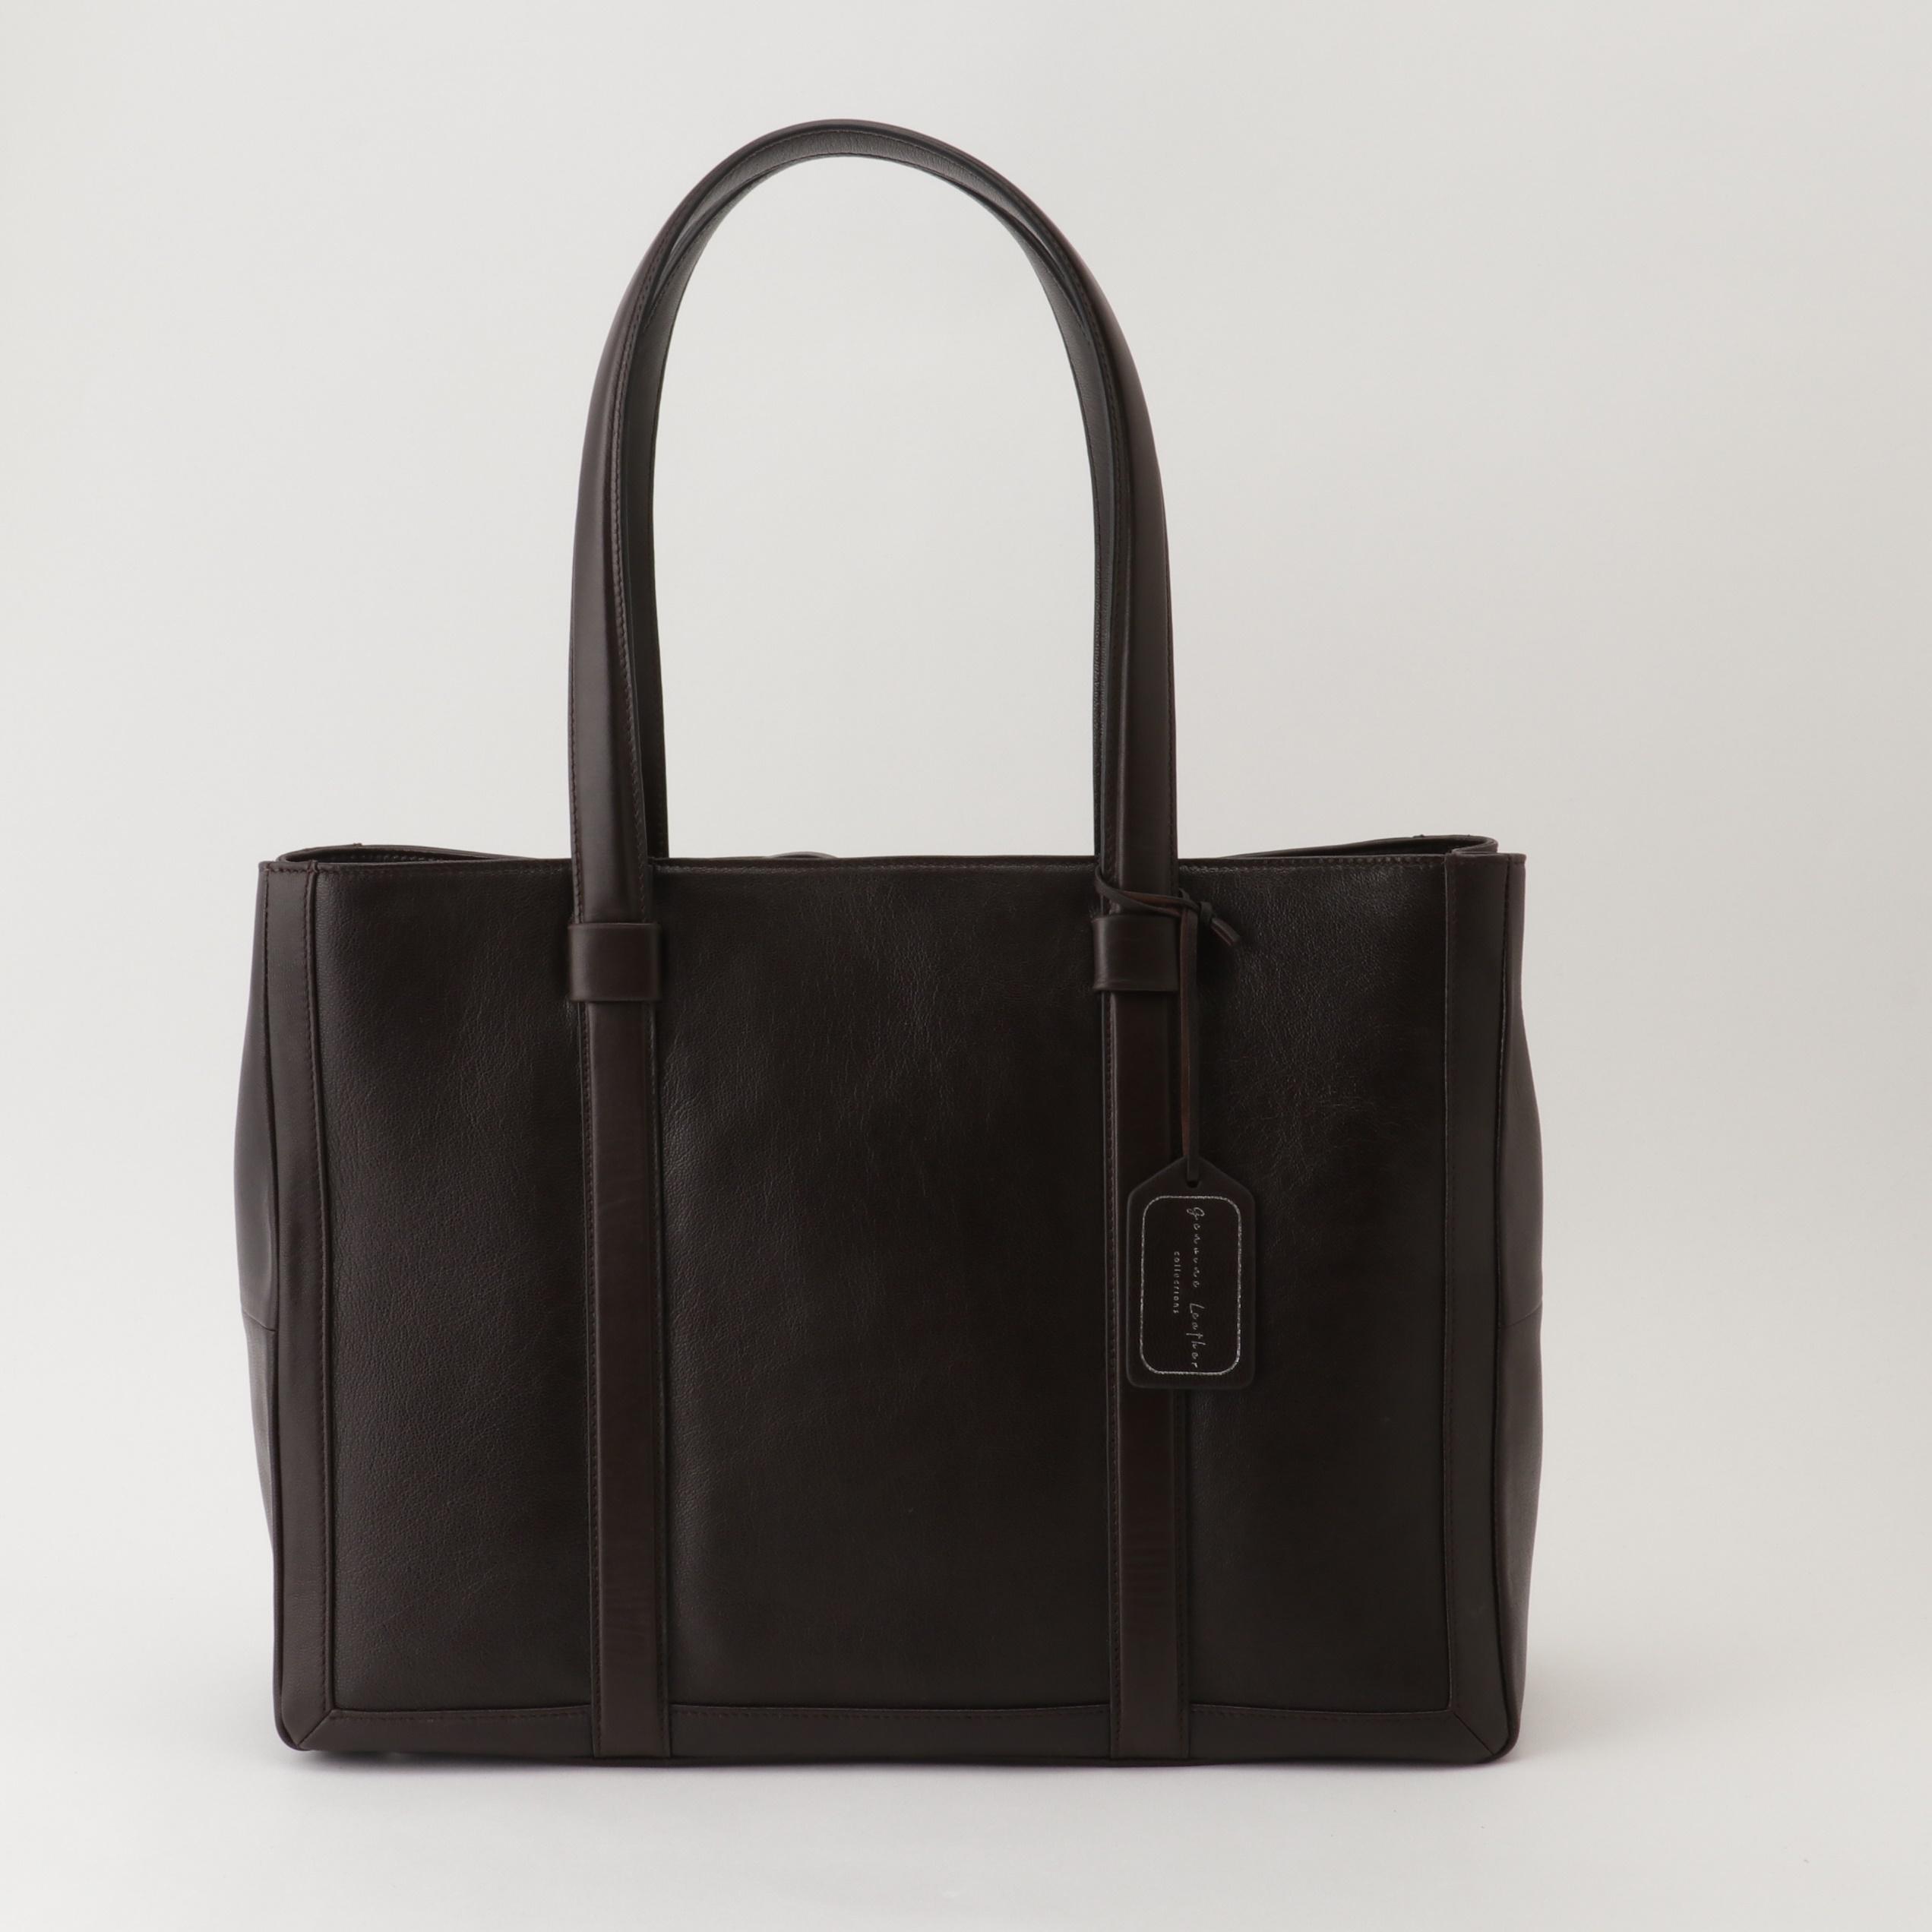 A4 WIDE TOTE BAG Ⅱ  男女兼用サイズ~当店オリジナル革製品ブランド、Genuine Leather